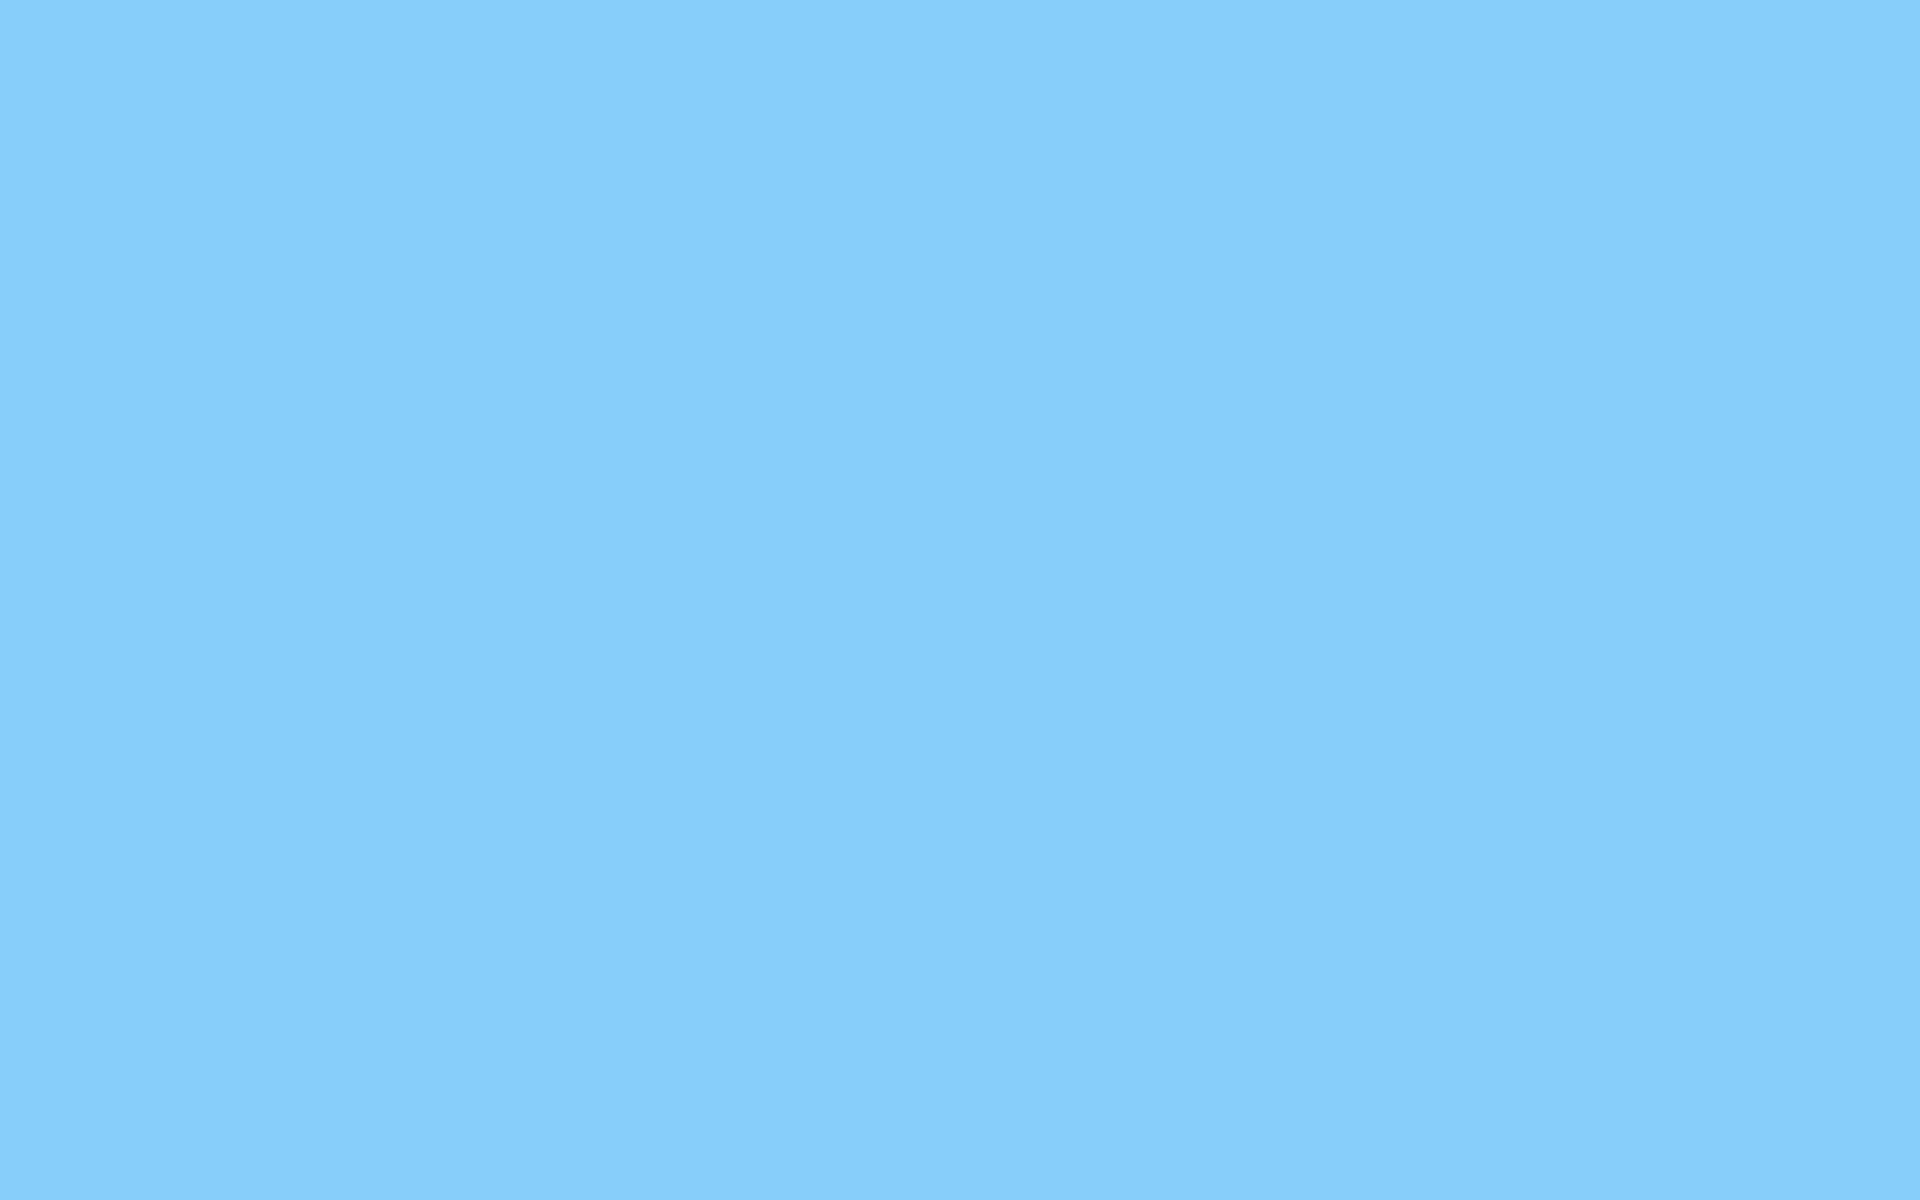 1920x1200 Light Sky Blue Solid Color Background